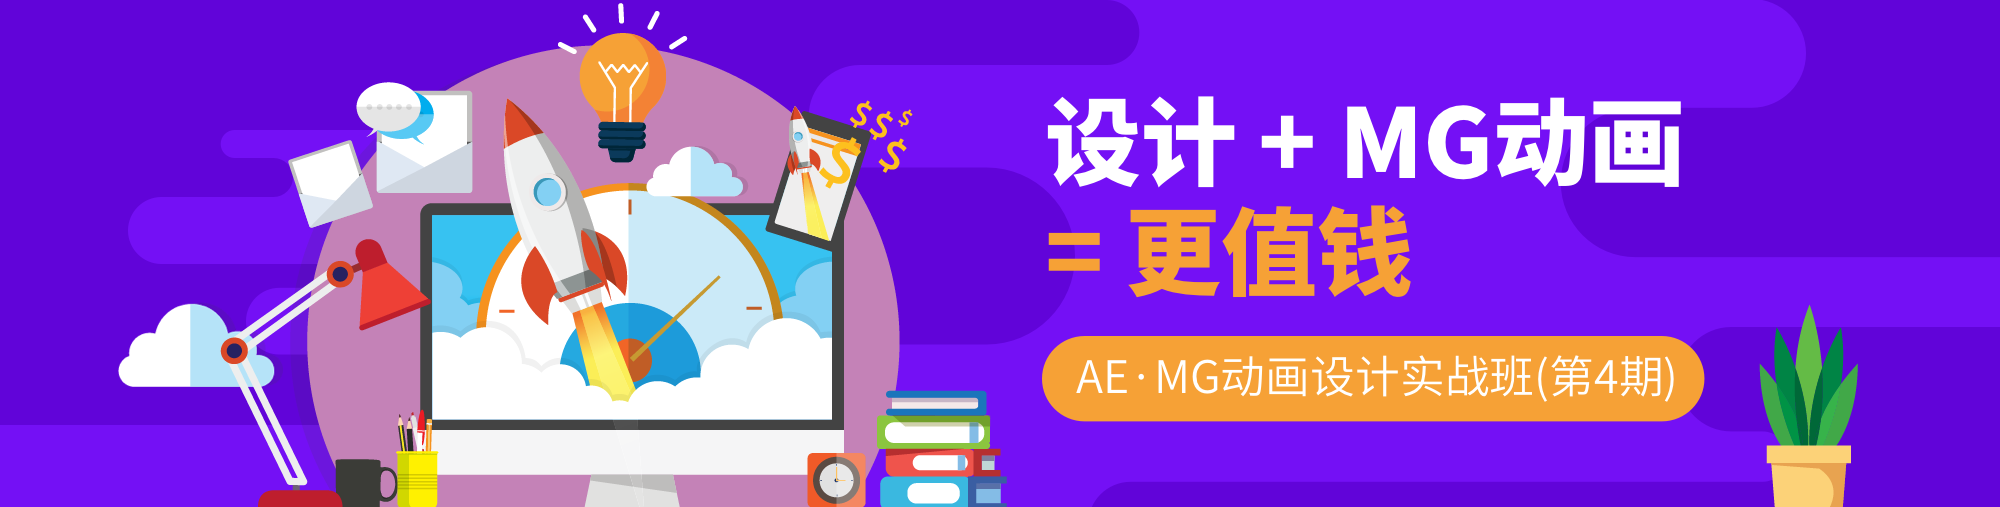 AE·MG动画设计实战全能班(第4期)